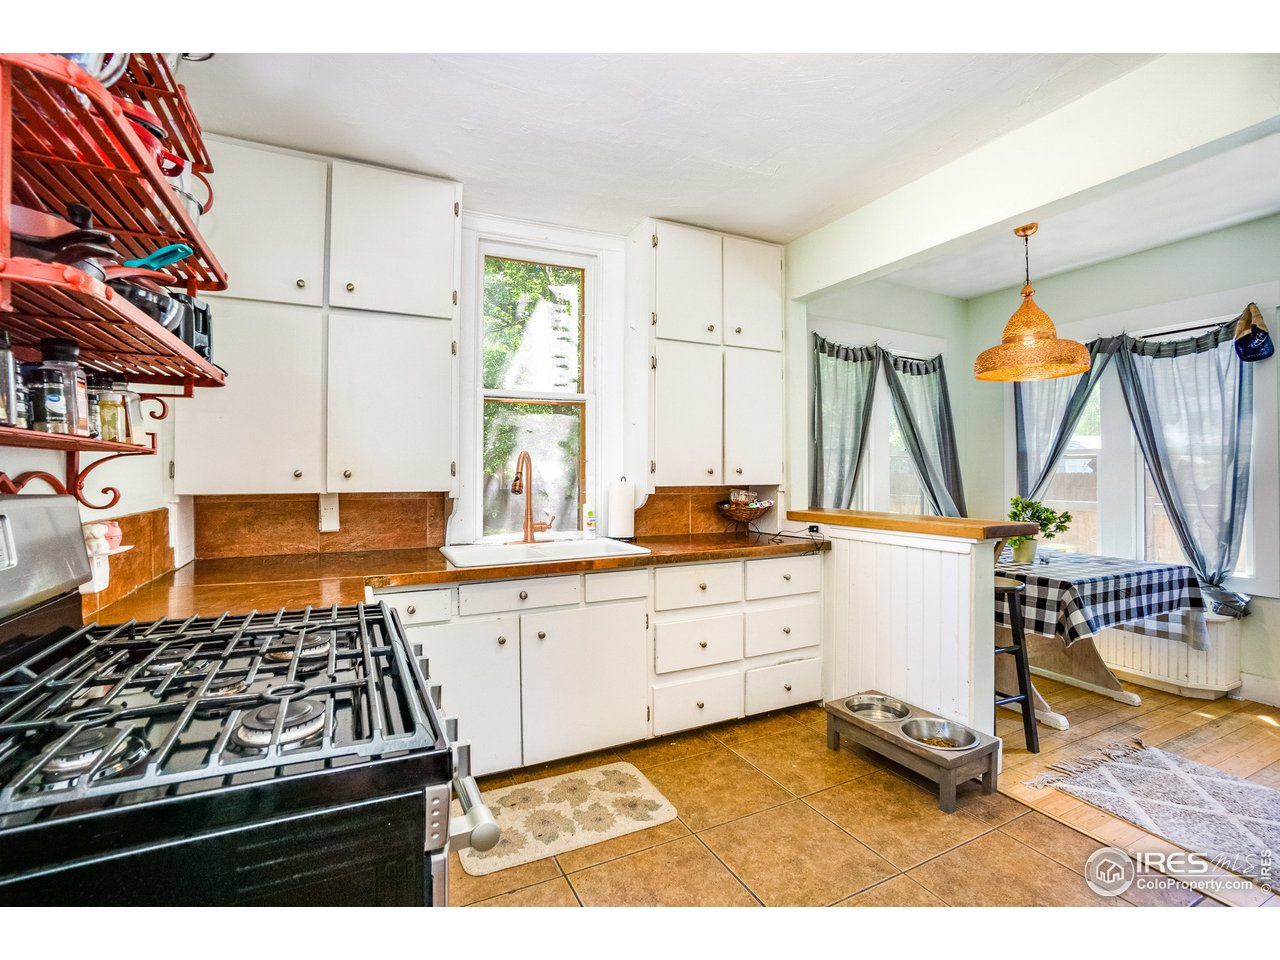 Farmhouse Style Kitchen with a ton of charm